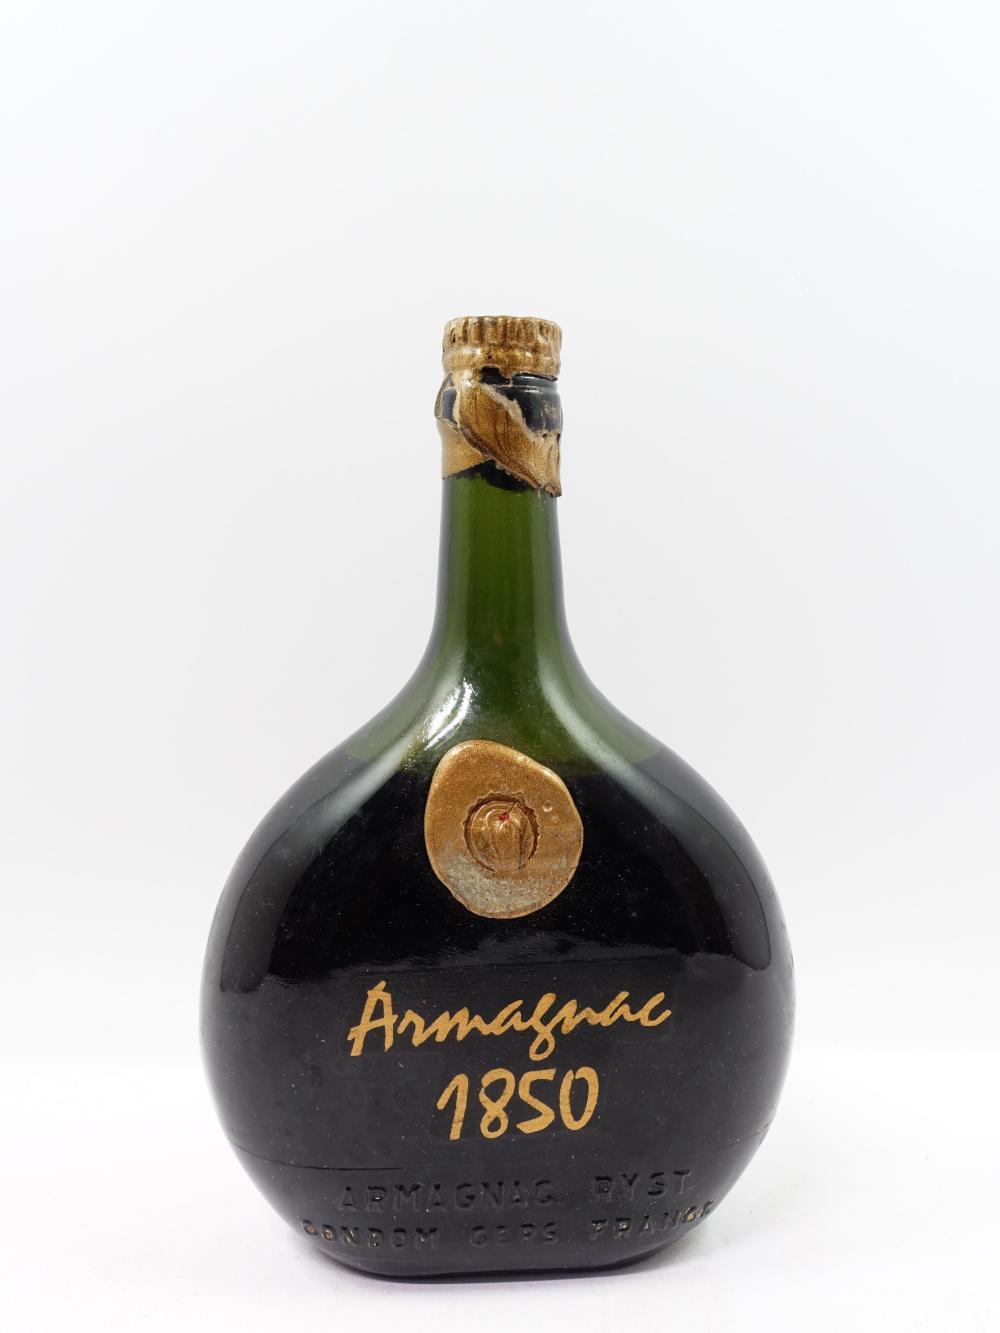 1 bouteille ARMAGNAC RYST 1850 J